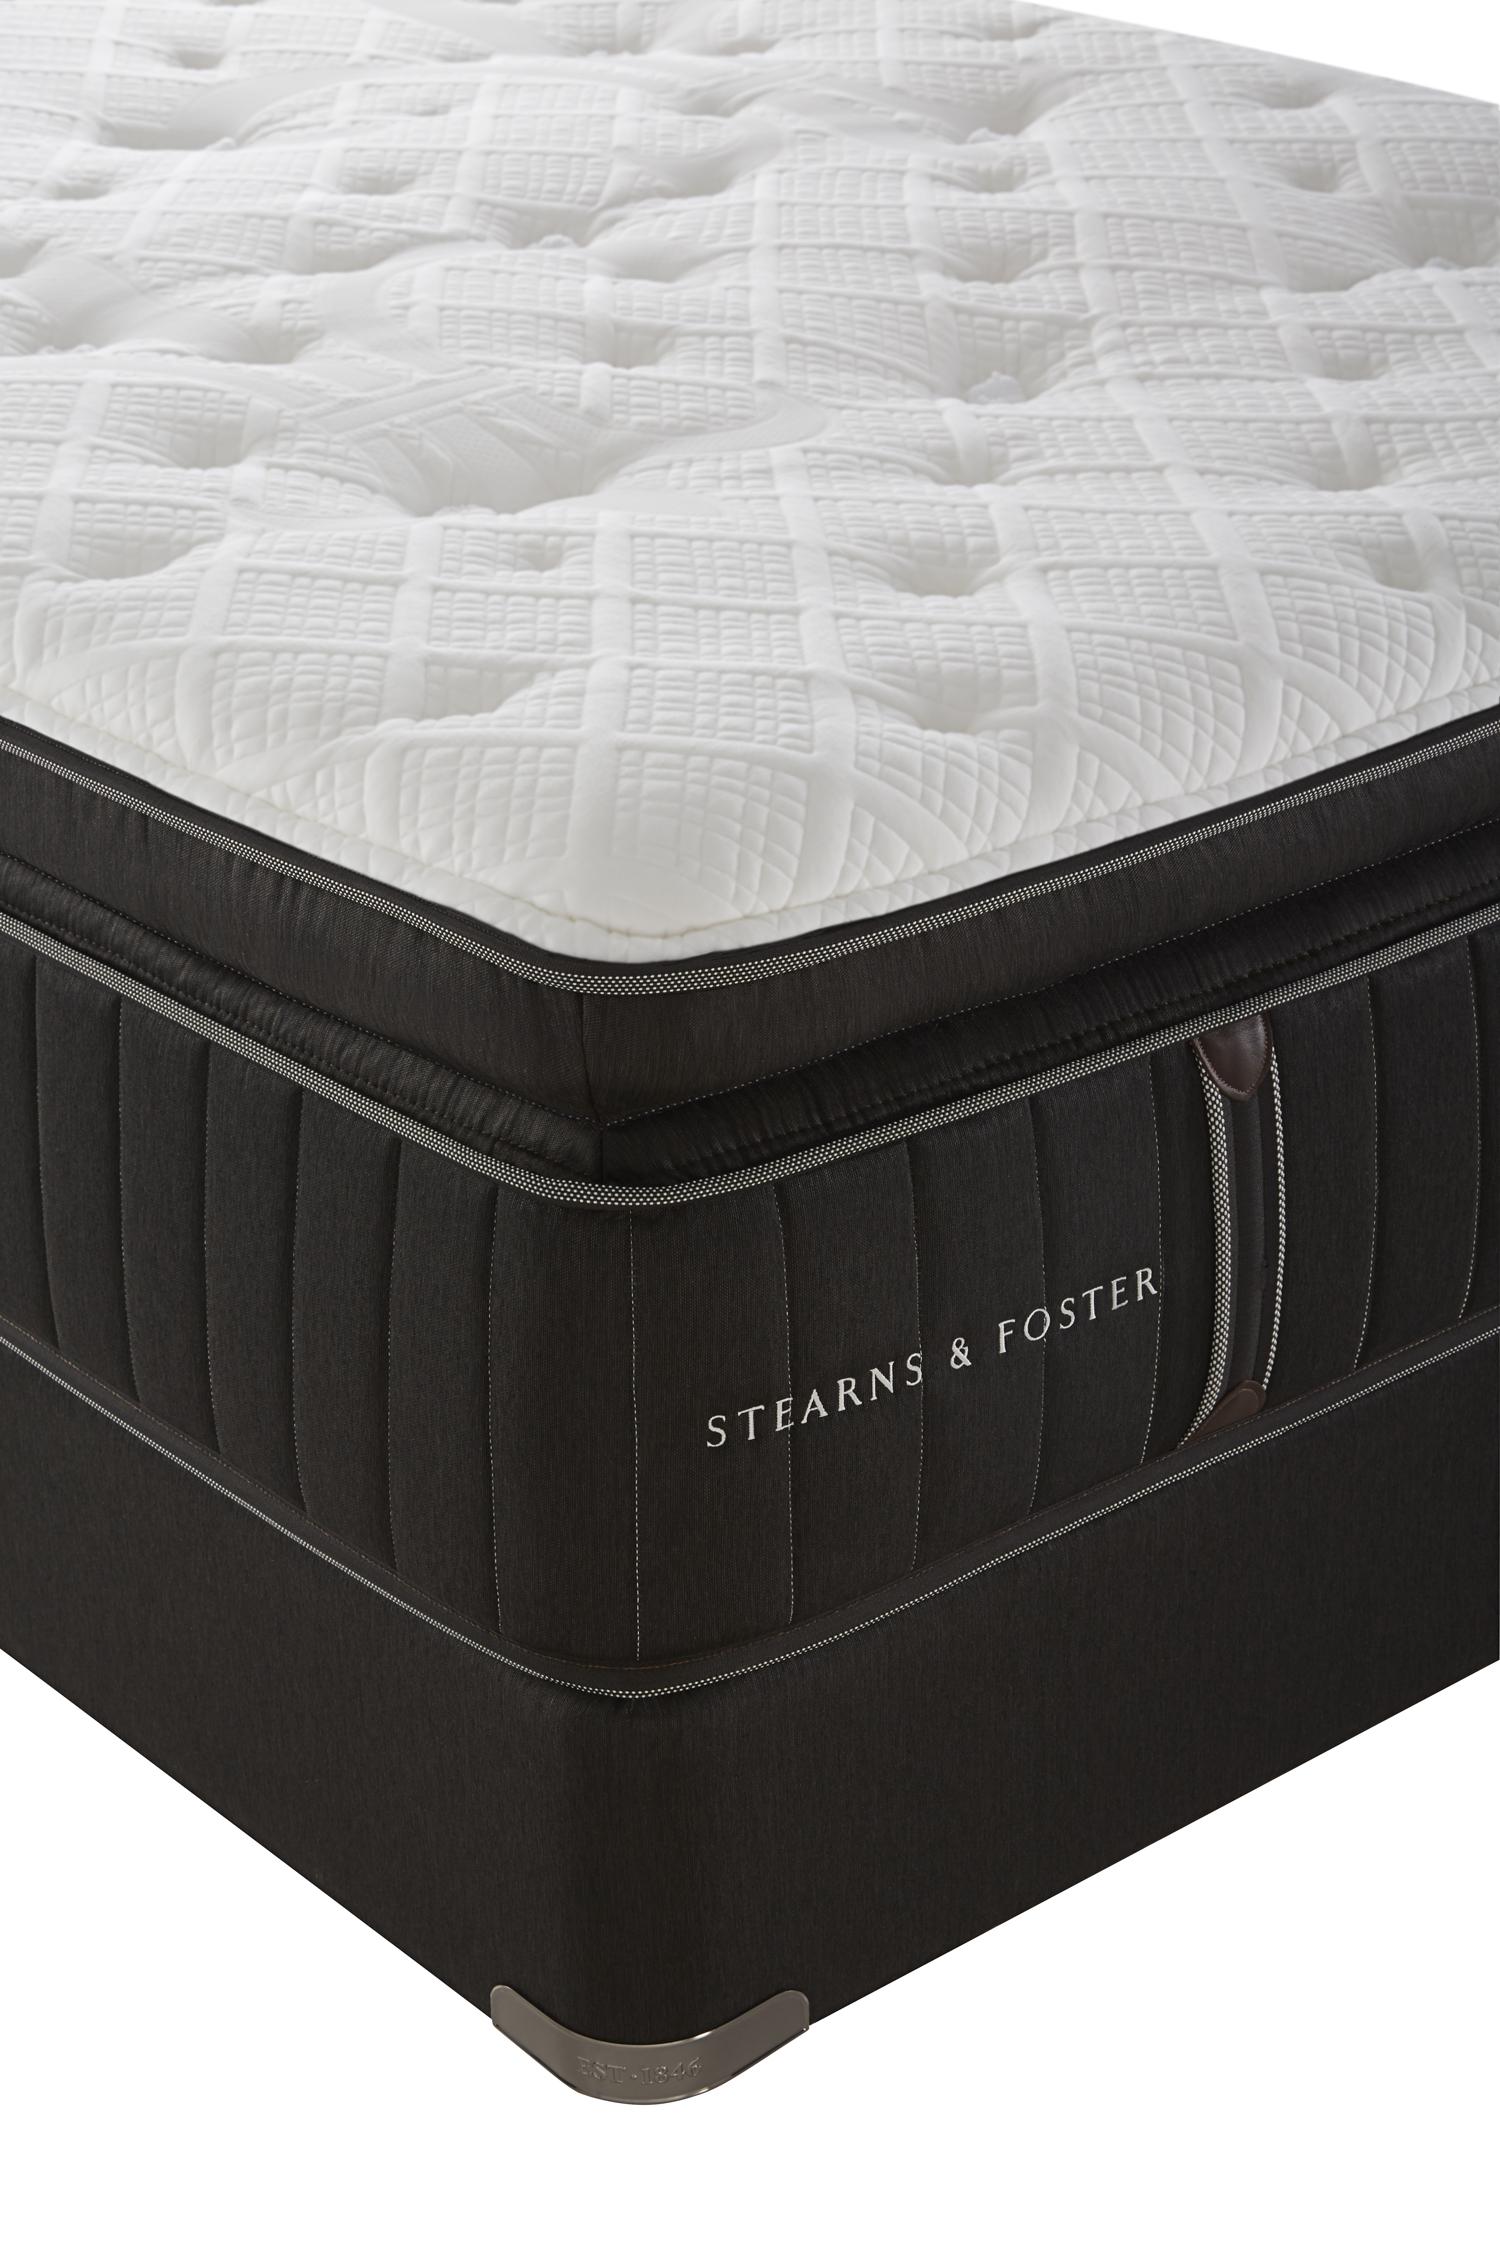 stearns foster lux estate owenton luxury plush euro top